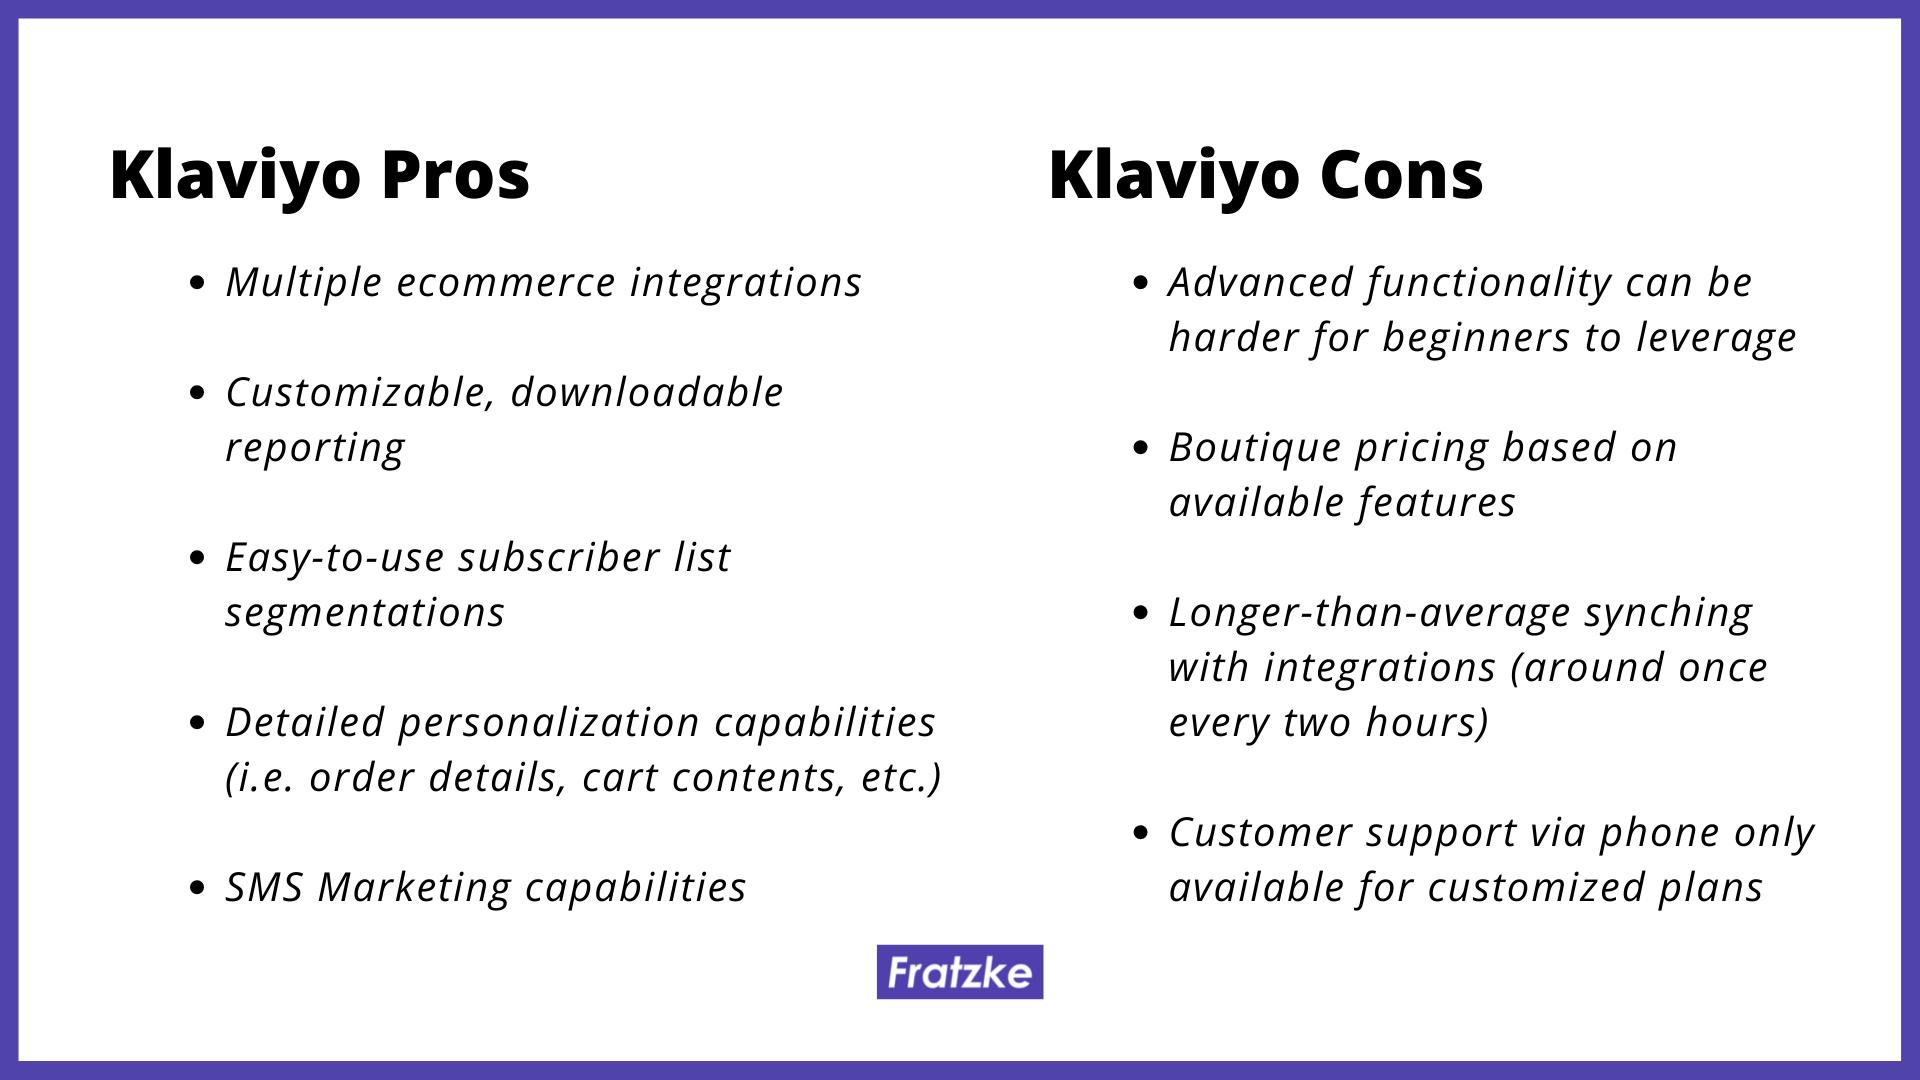 Klaviyo pros and cons by Fratzke